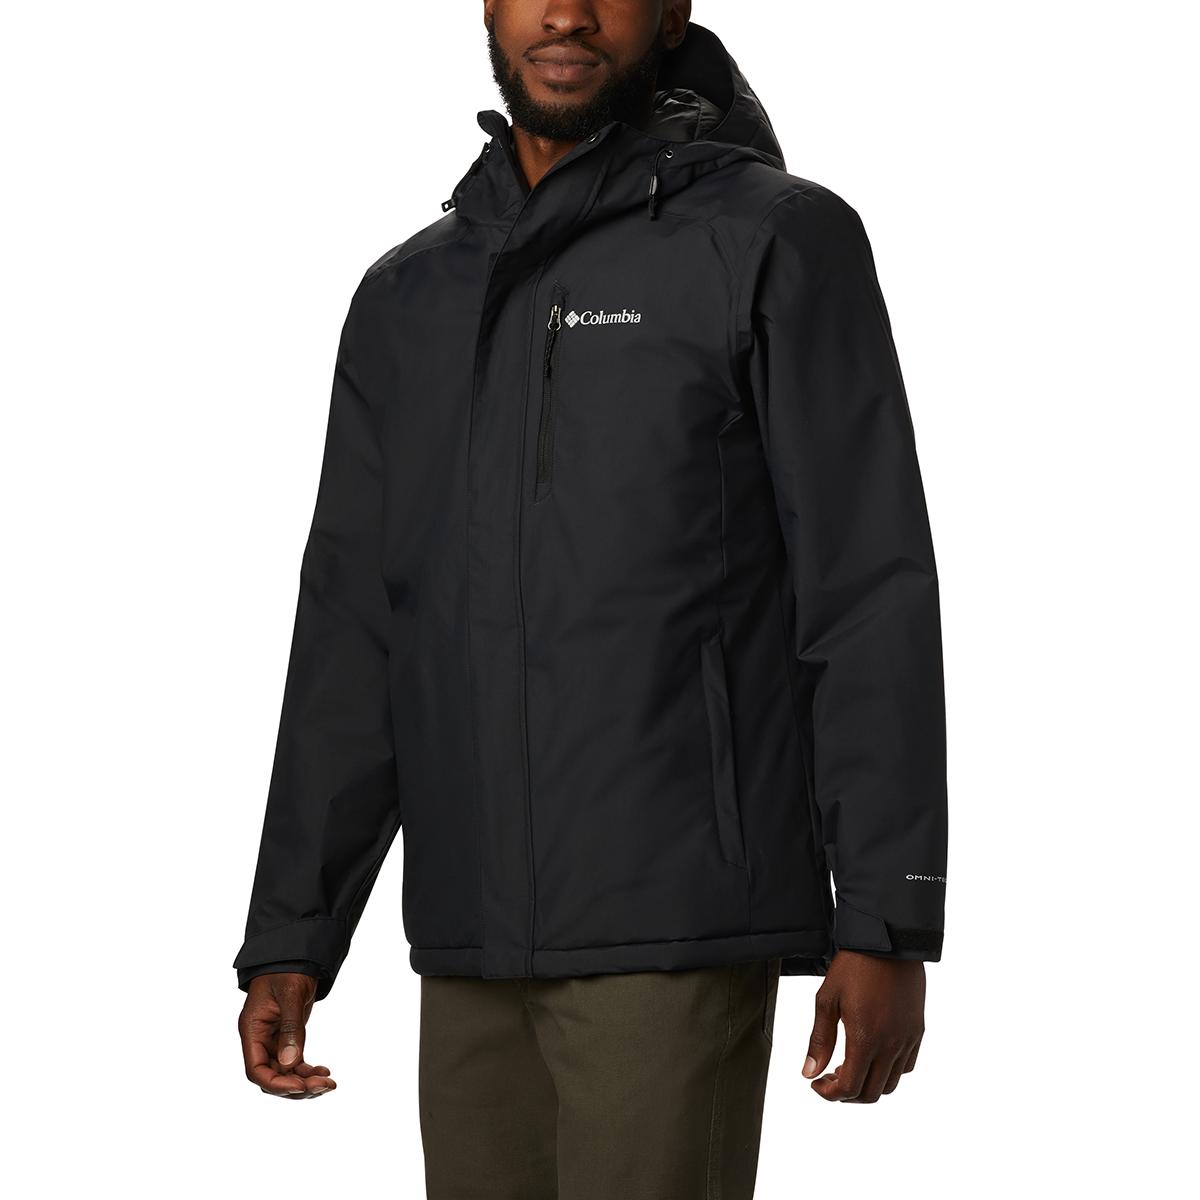 Columbia Men's Tipton Peak Insulated Jacket - Black, M